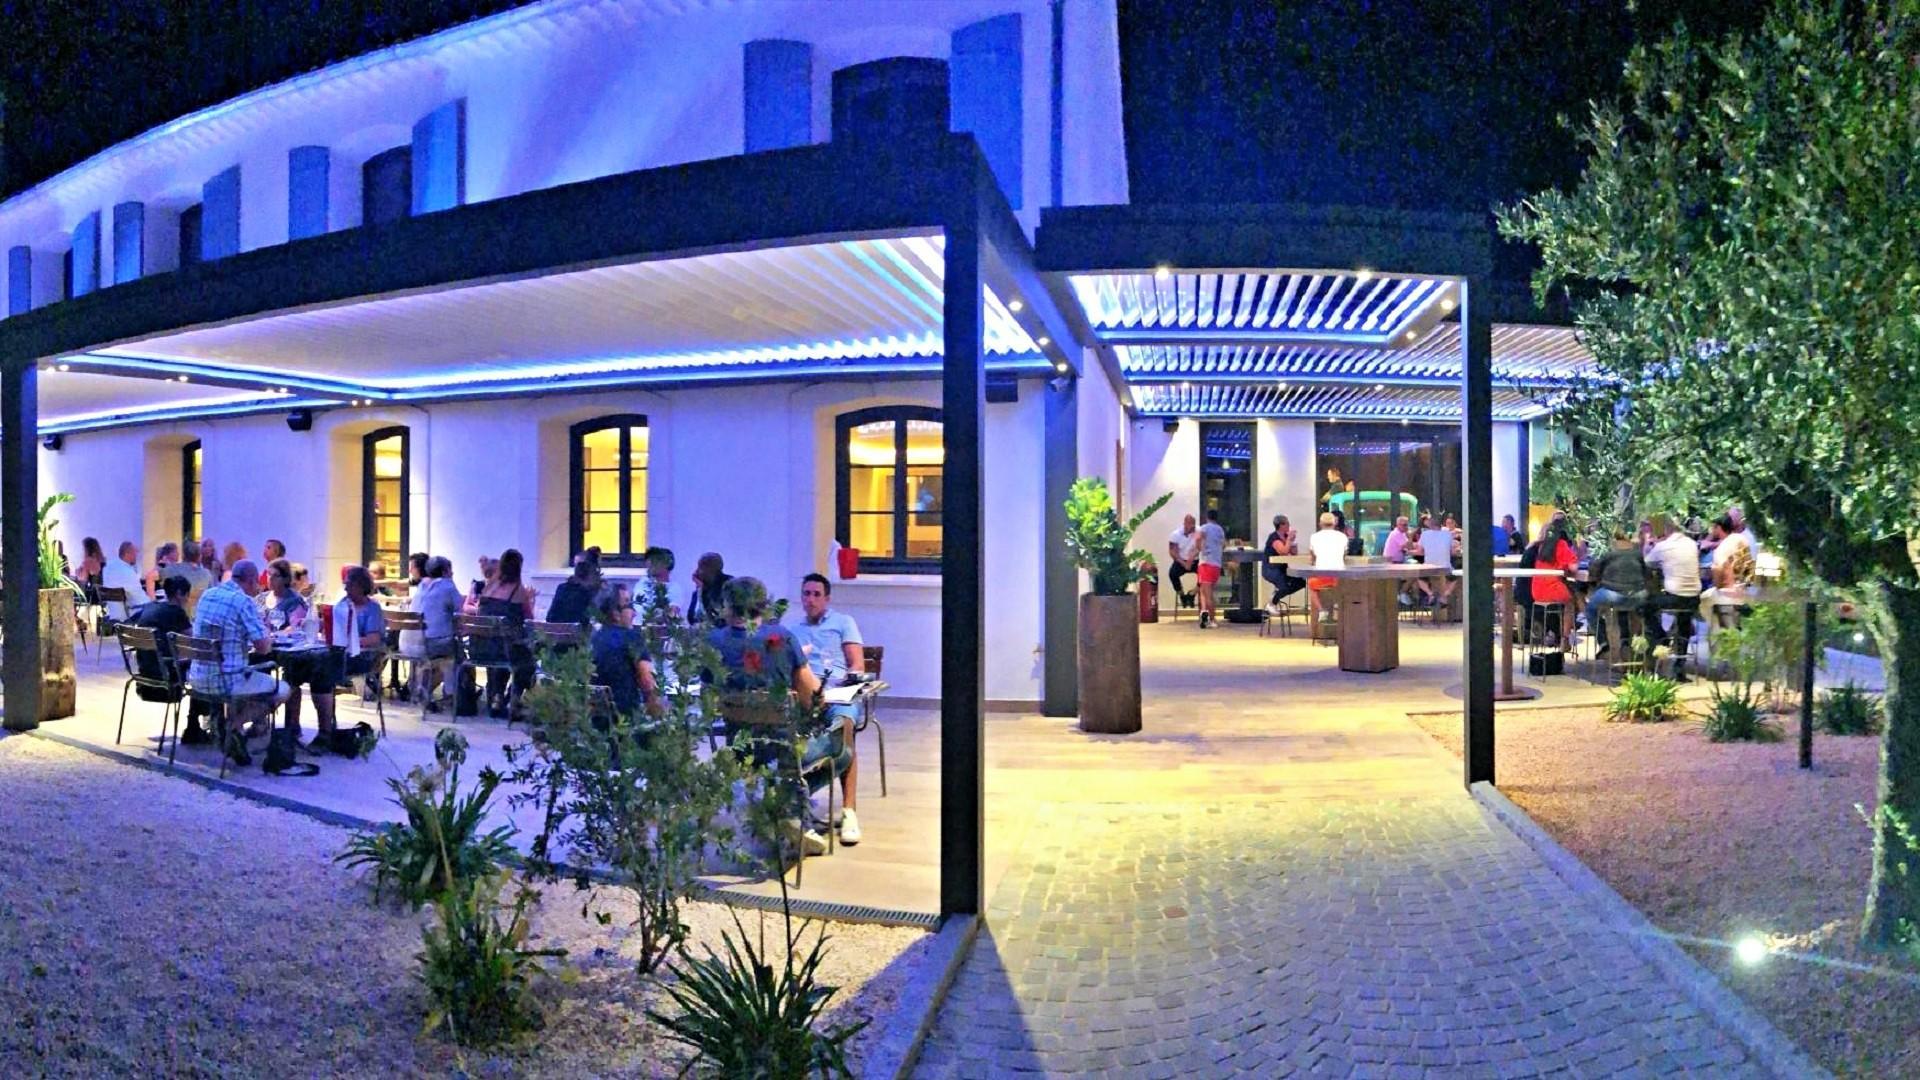 Hotel 1770-avignon-provence-sud-france-restaurant factory-seminaires-de-caractere